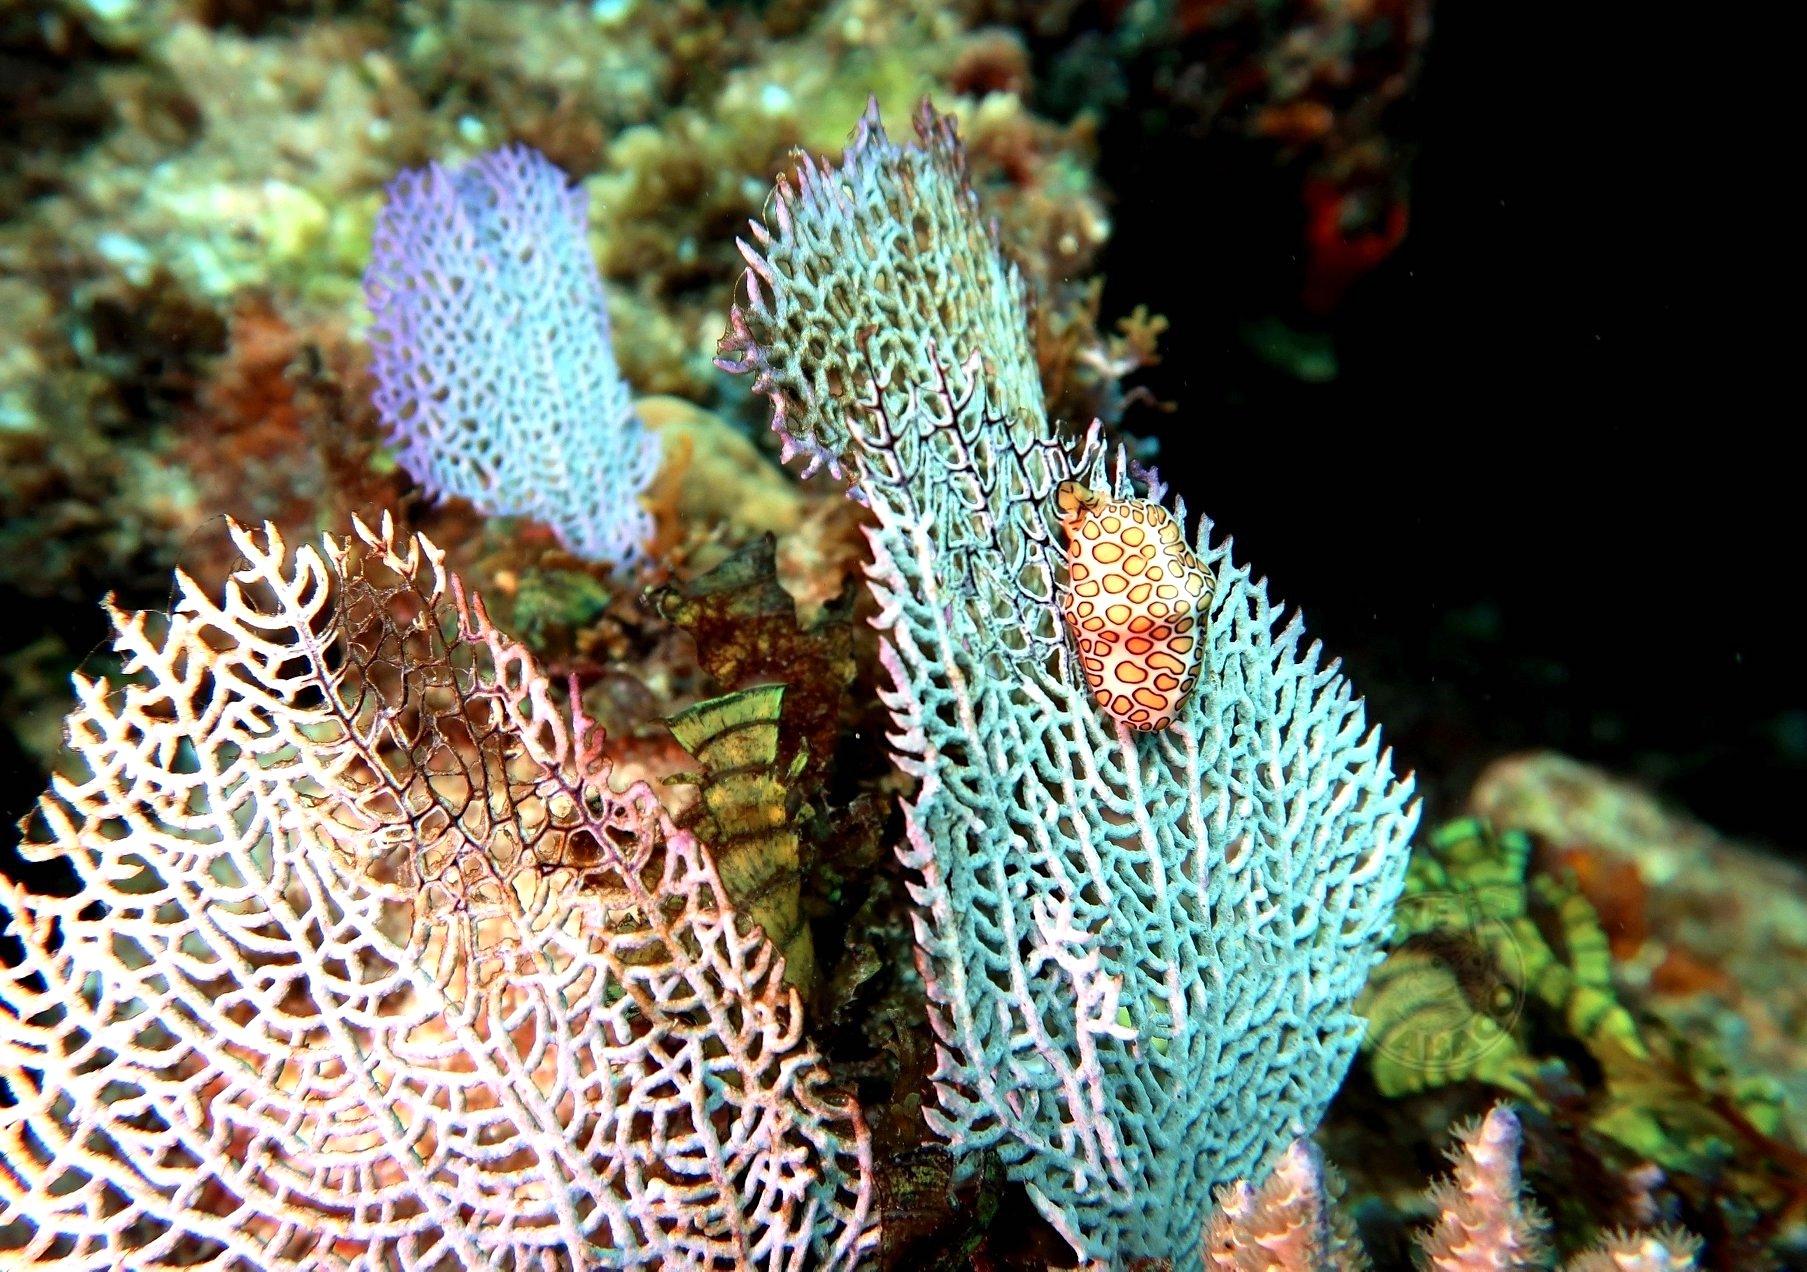 Purple Sea Fans, Abaco, Bahamas (Dive Abaco / Keith & Melinda Rogers)